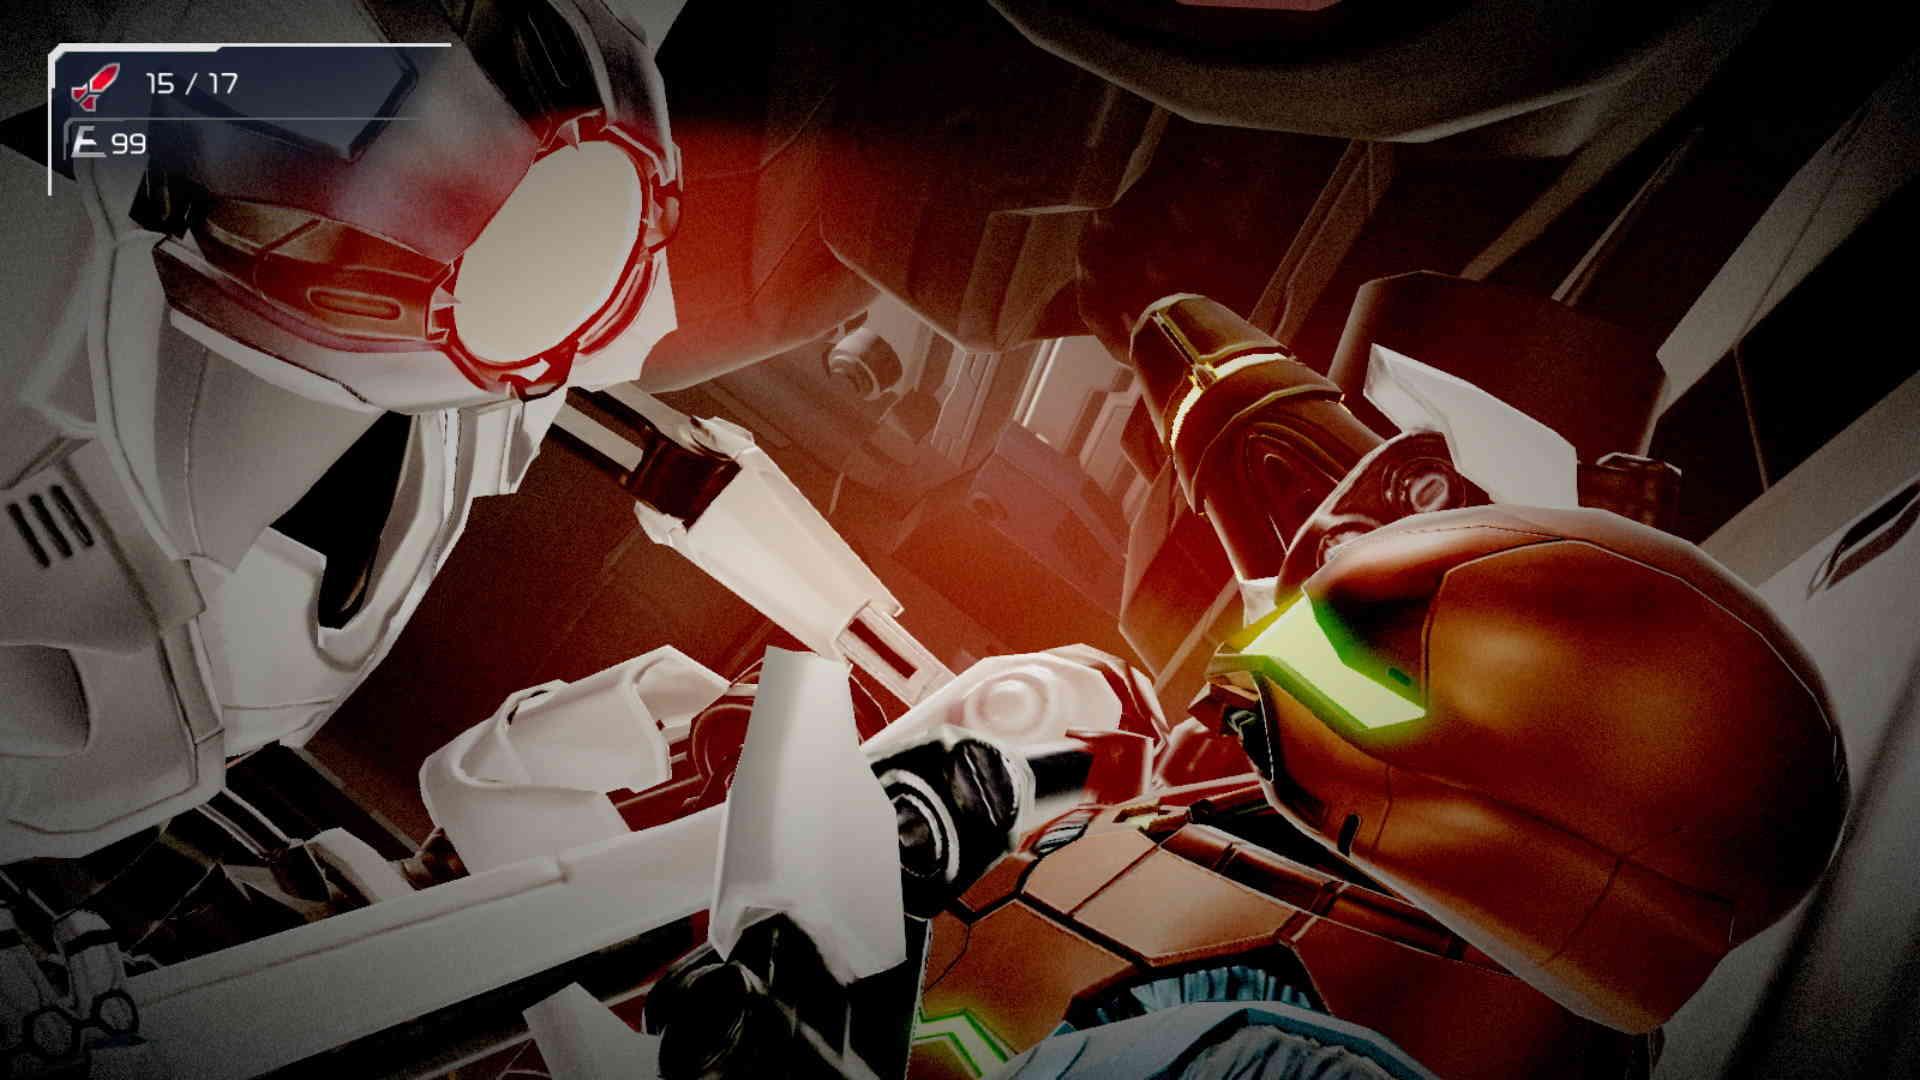 Metroid Dread's storyline